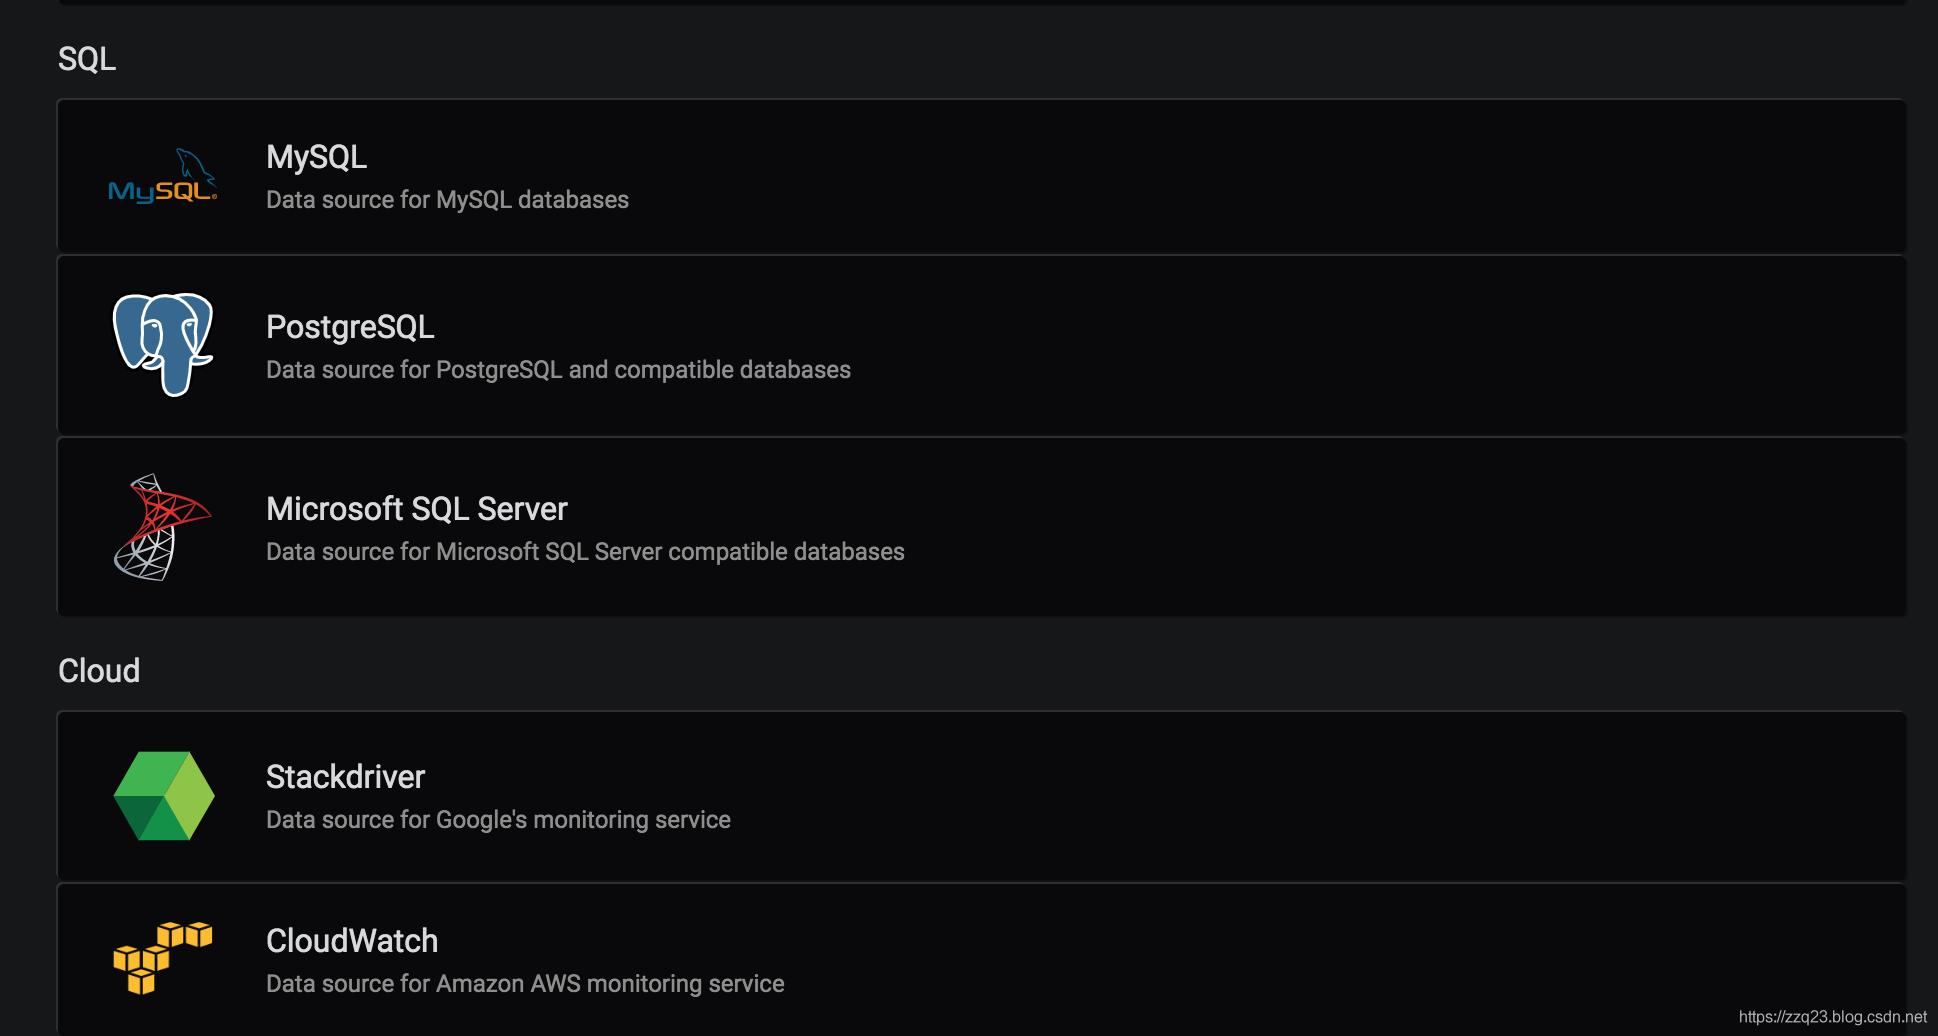 grafana使用MYSQL数据源展示3